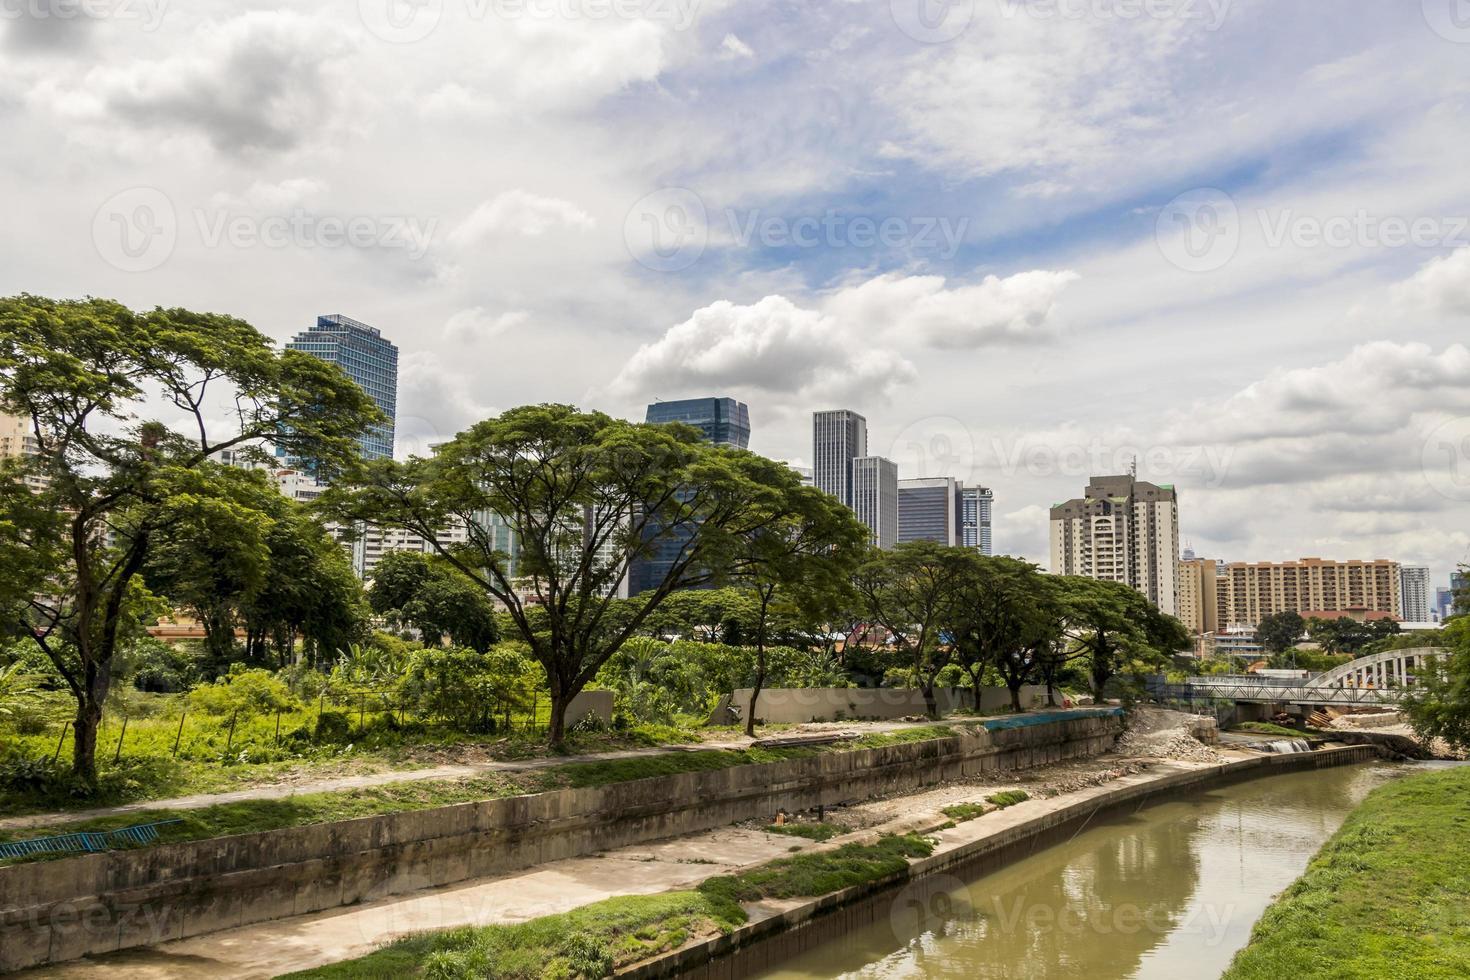 Huge skyscrapers behind tropical nature and river, Kuala Lumpur. photo